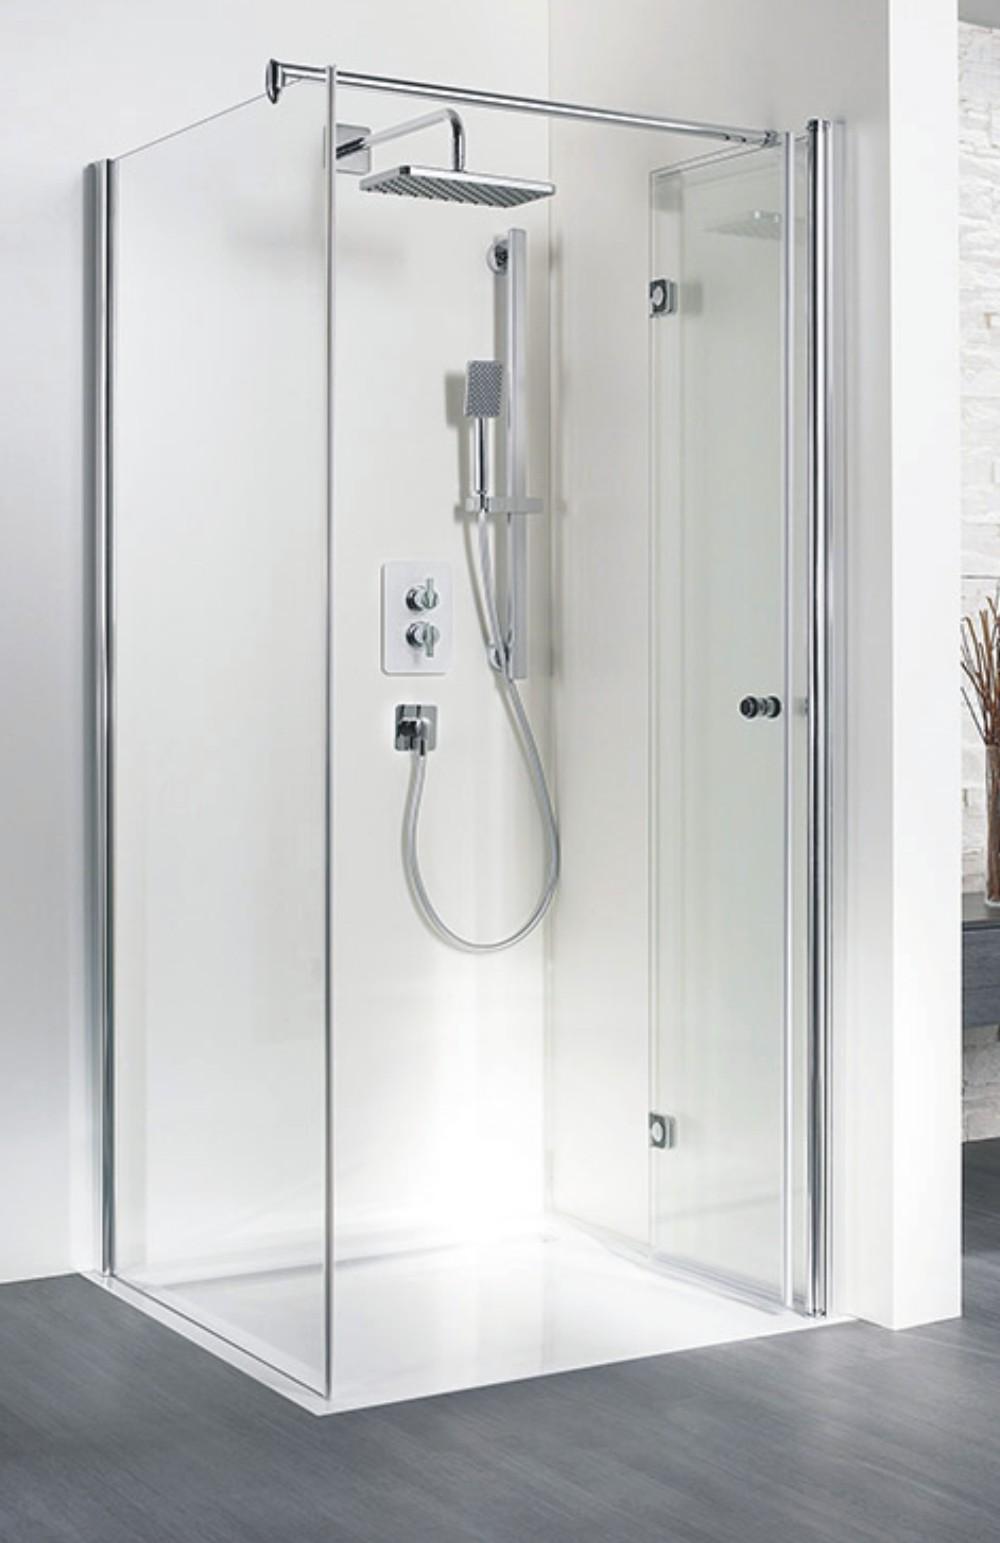 hsk duschkabine exklusiv c rechteck dusche drehfaltt r. Black Bedroom Furniture Sets. Home Design Ideas